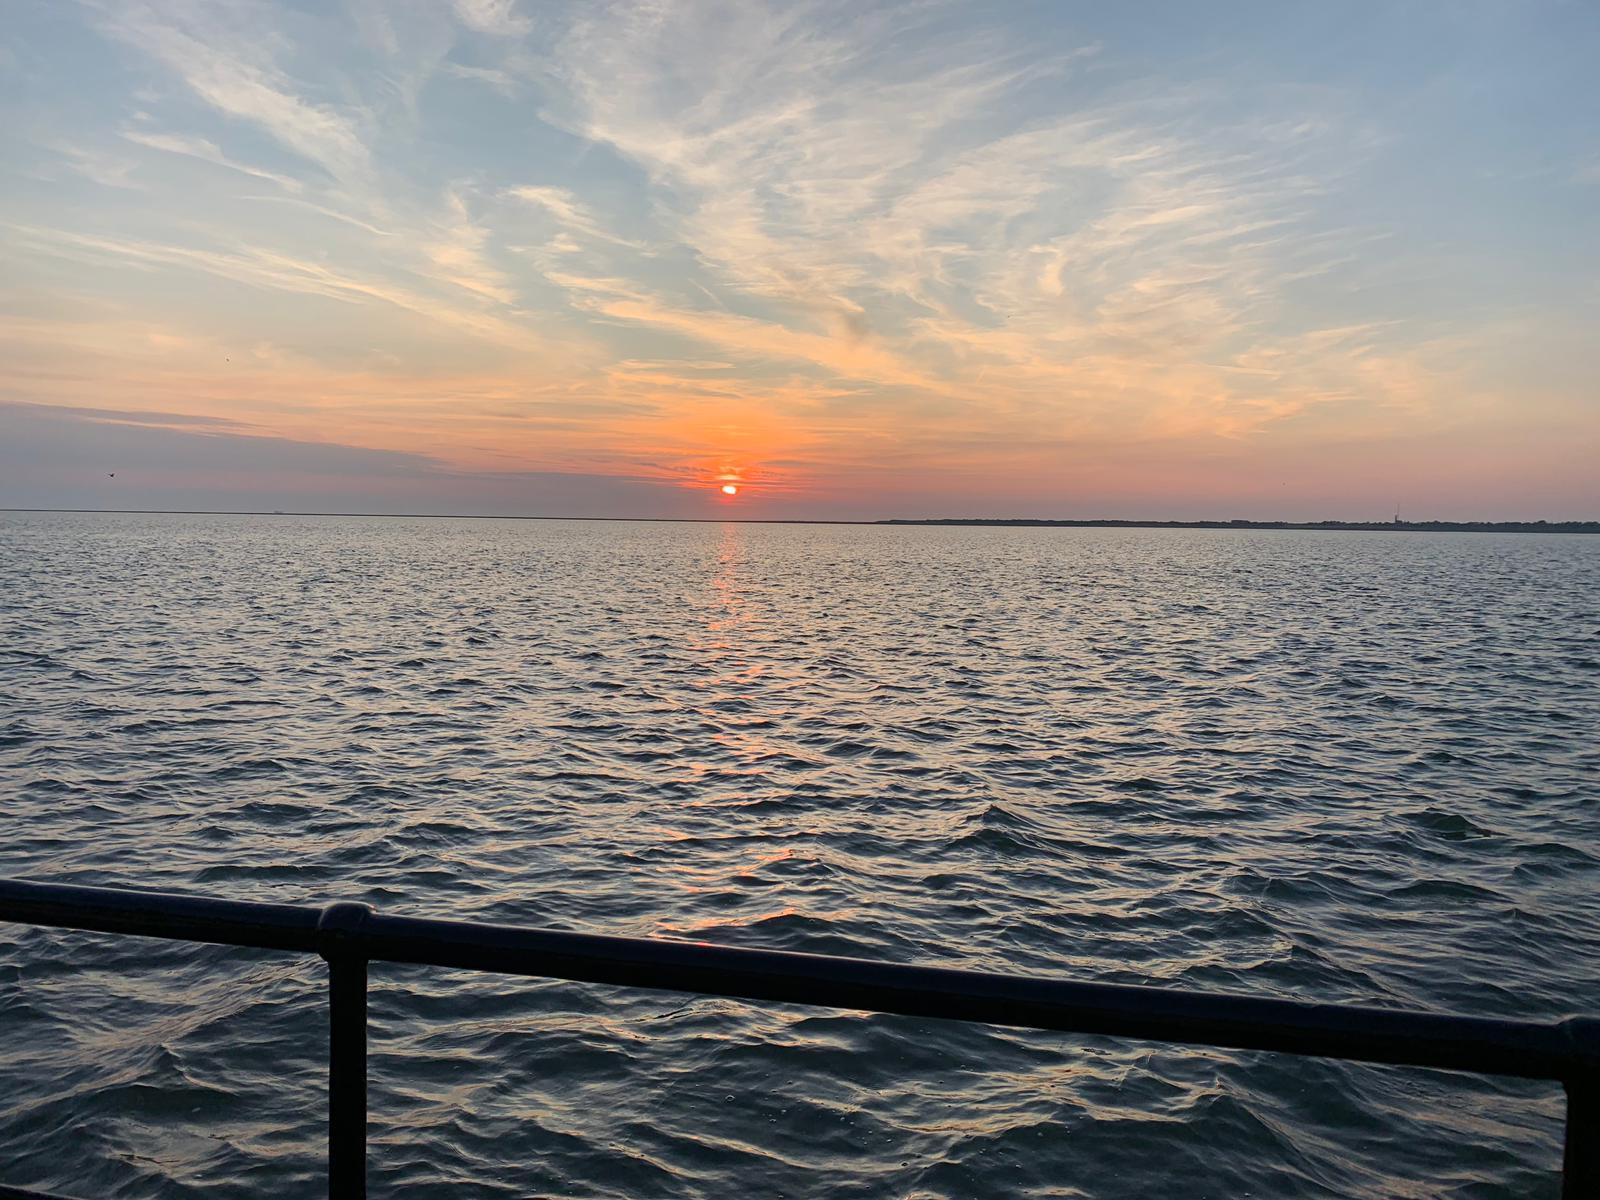 klipper nova cura zonsondergang schiermonnikoog